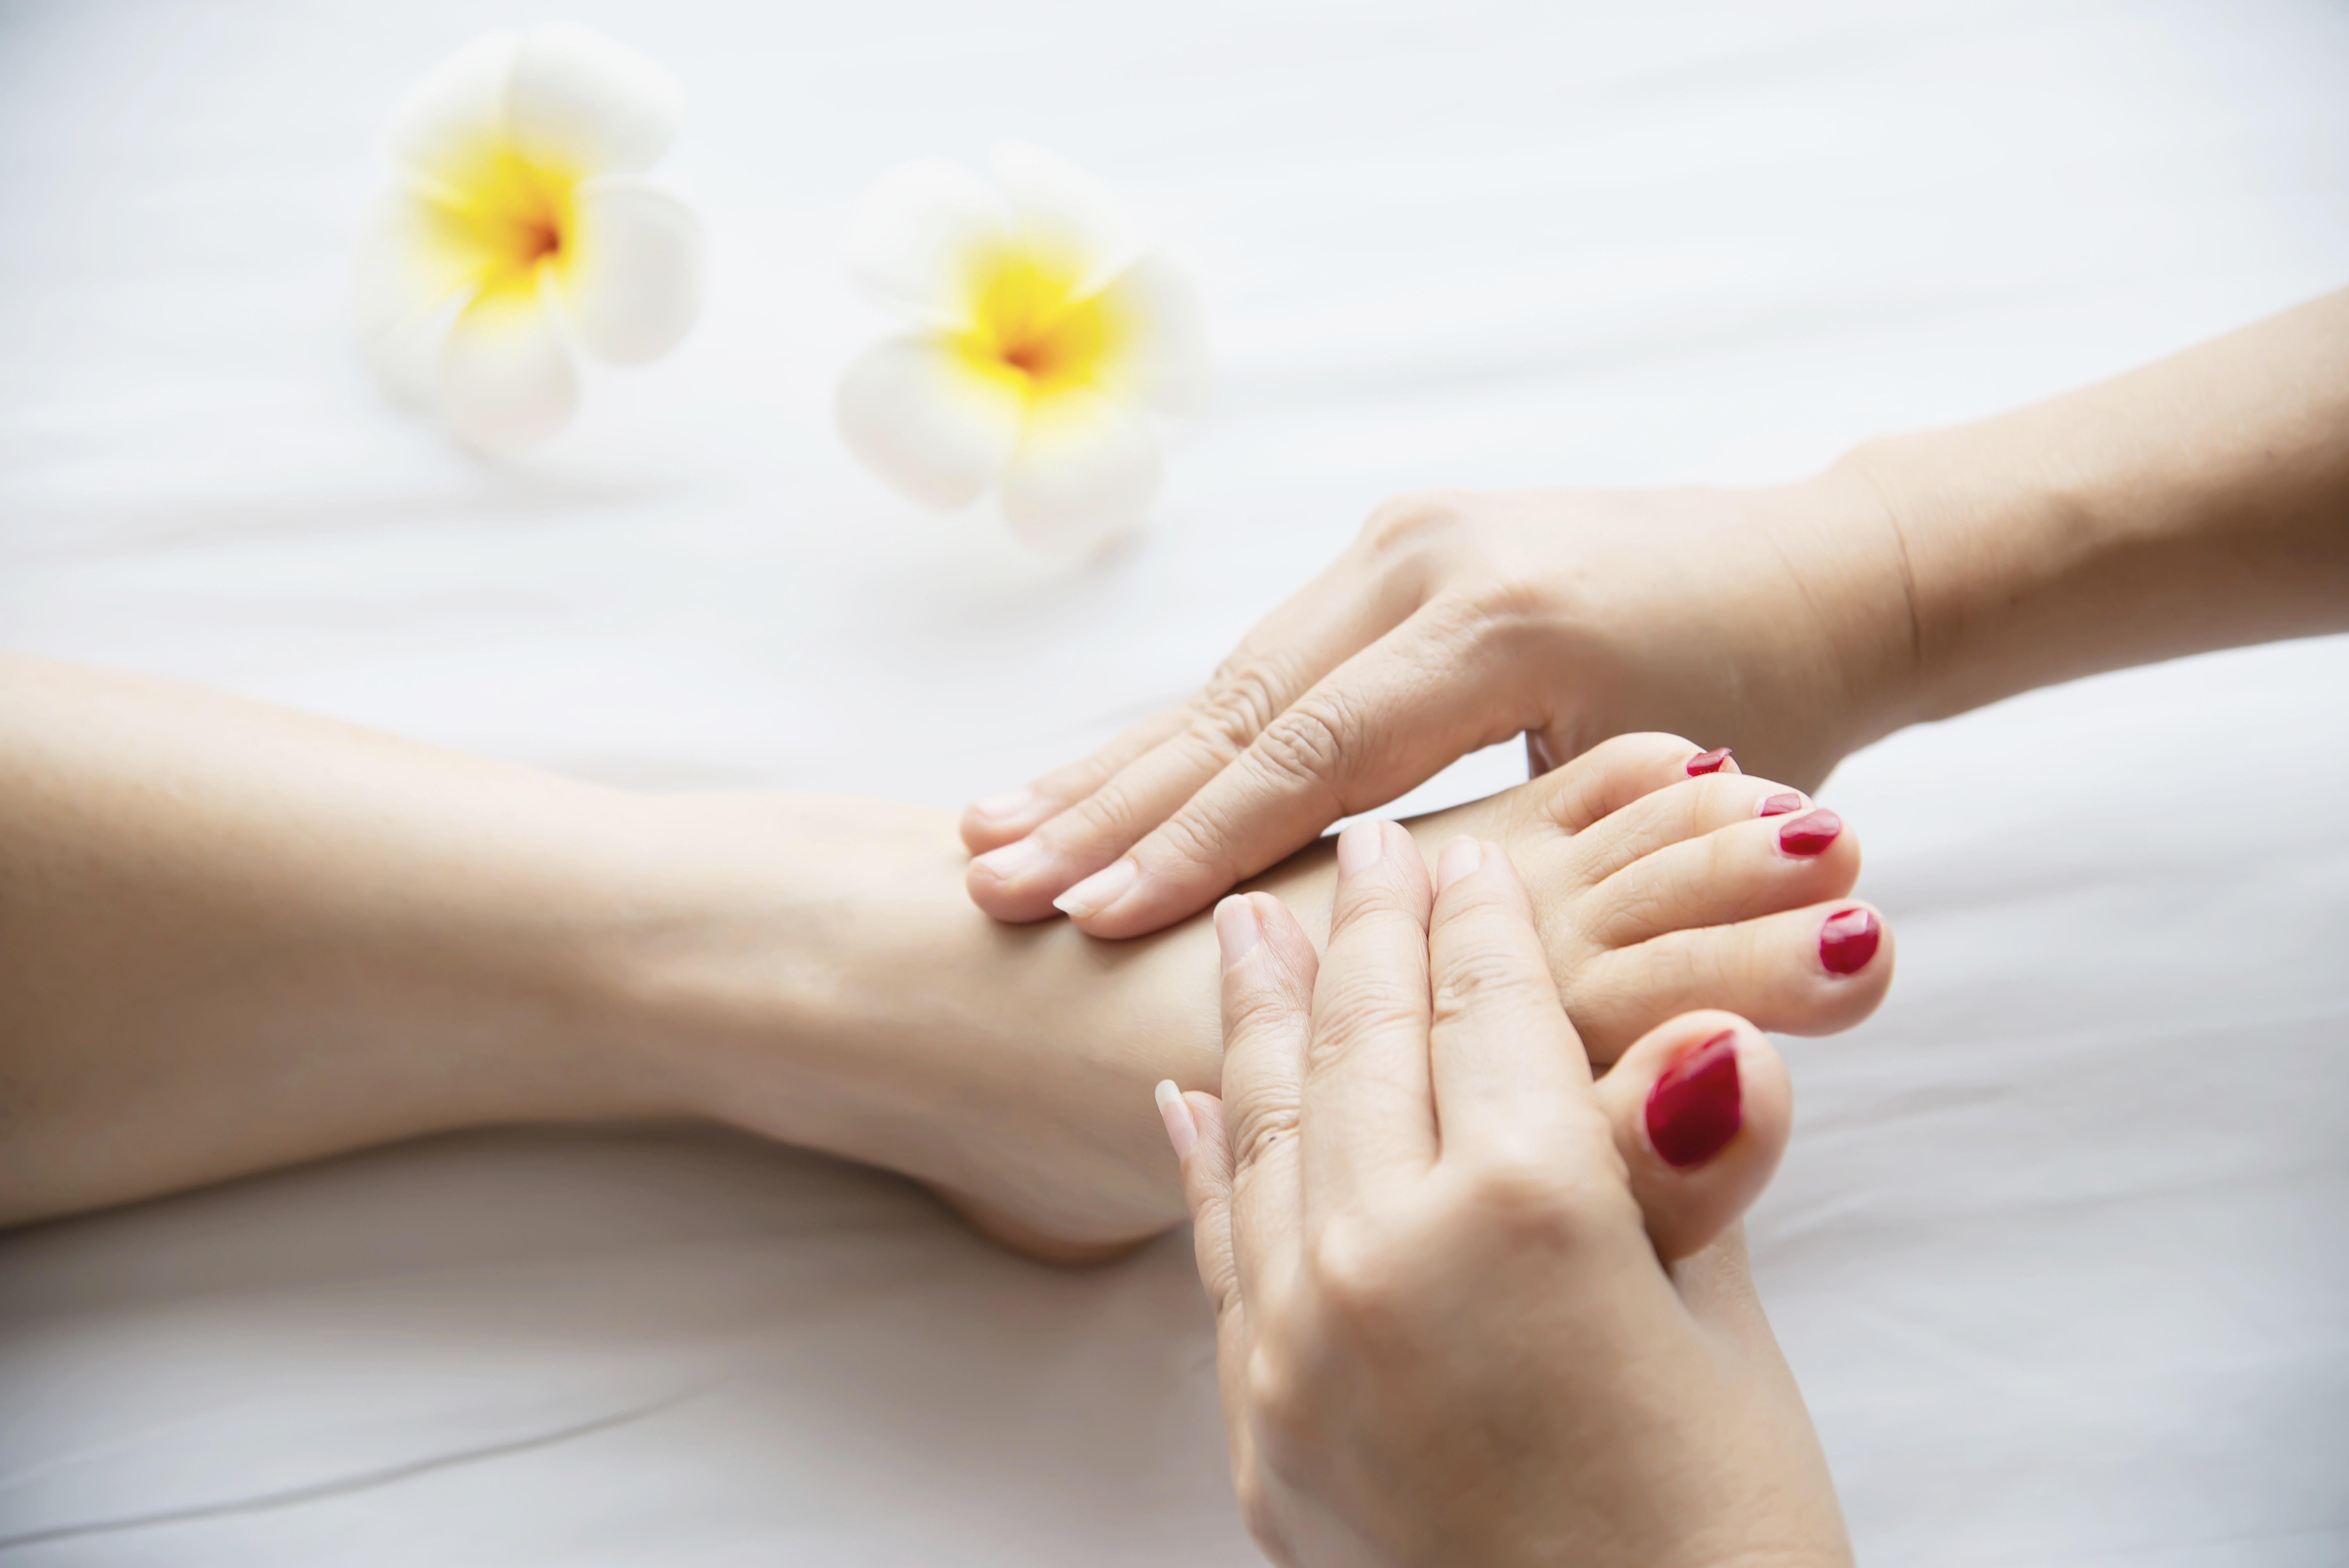 Mon - Thu Special 60min - Foot Massage